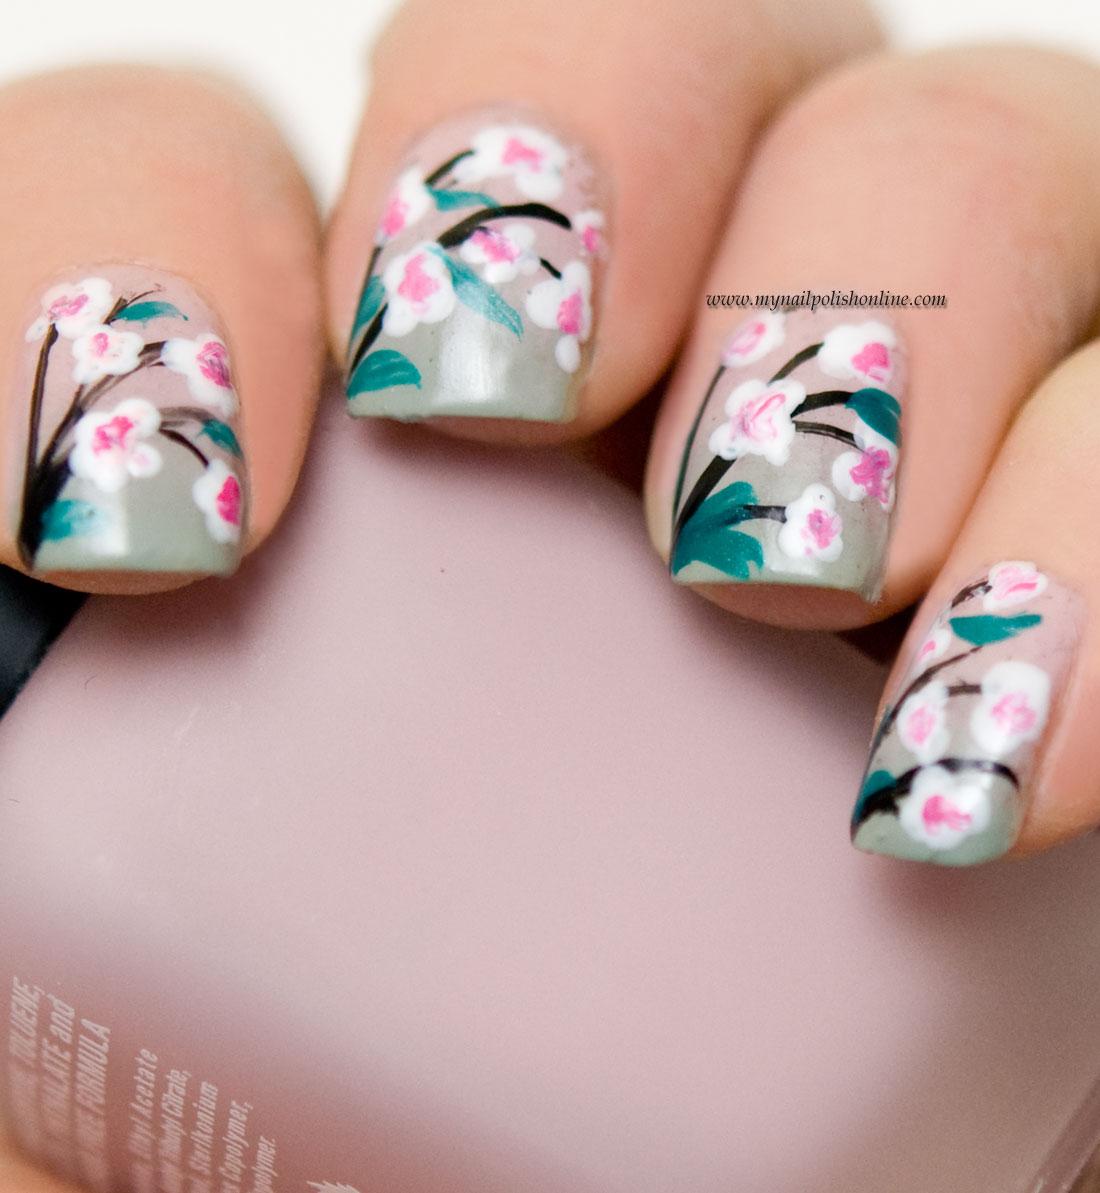 Nail Art - Flowers - My Nail Polish Online